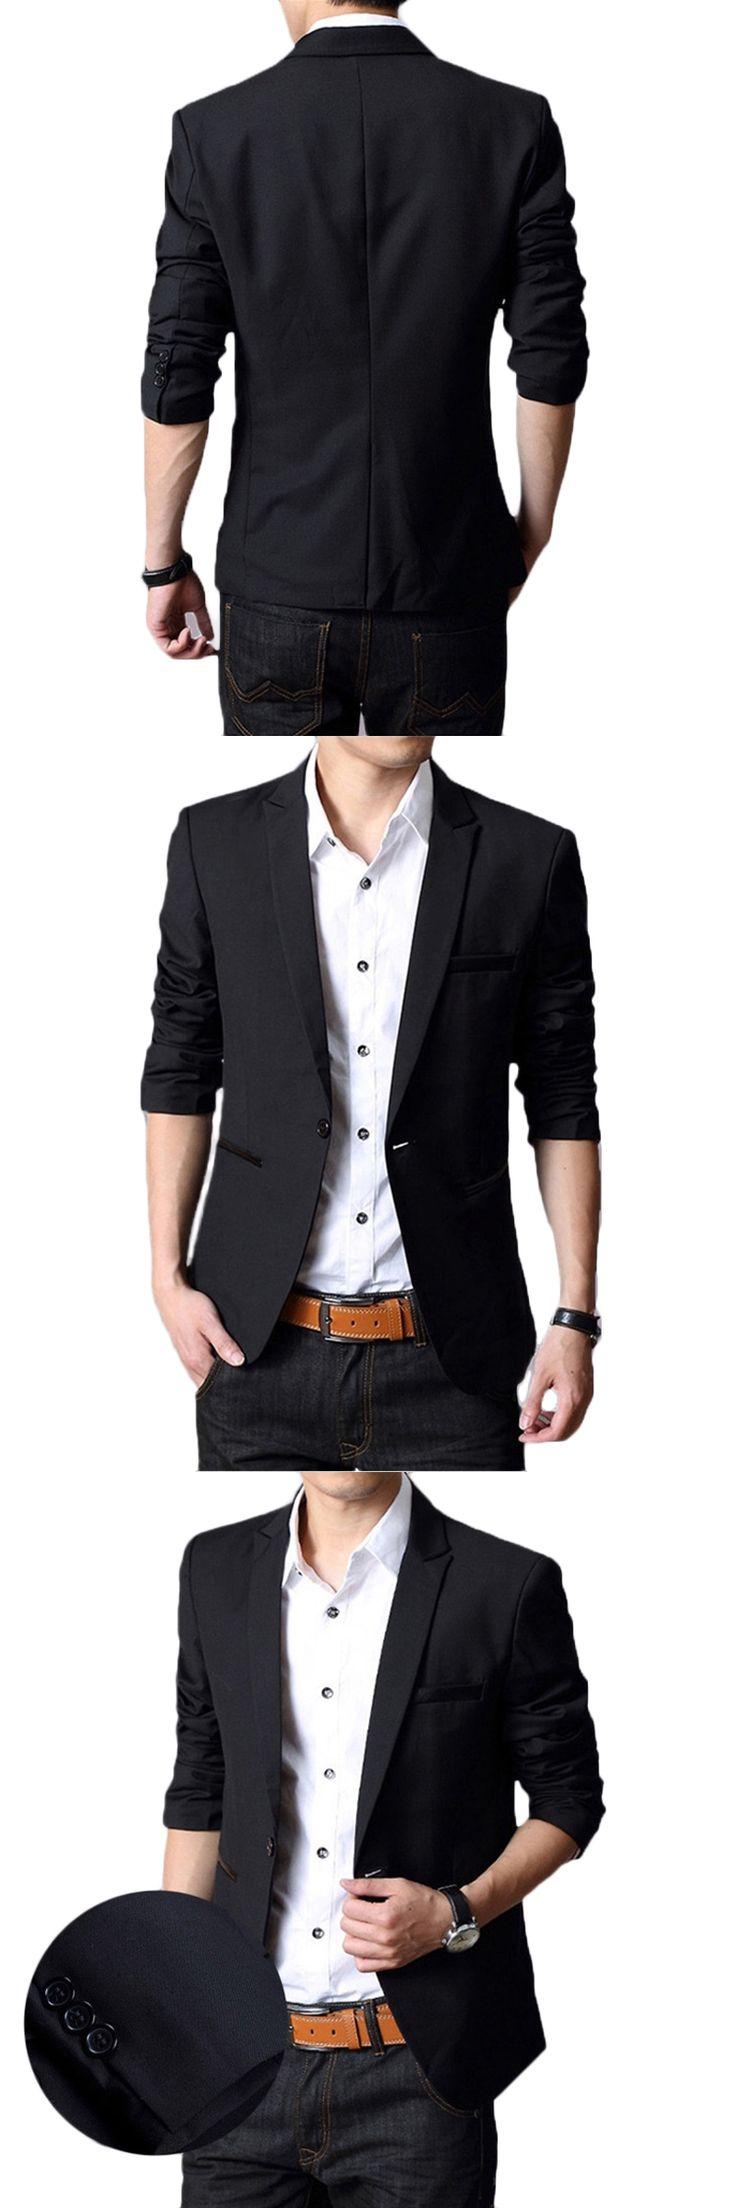 New Solid Color Blazer Men Brand Casual Slim Fit Long Sleeve Blazer Homme Single Button Cotton Autumn 2017 Mens Blazers 5XL